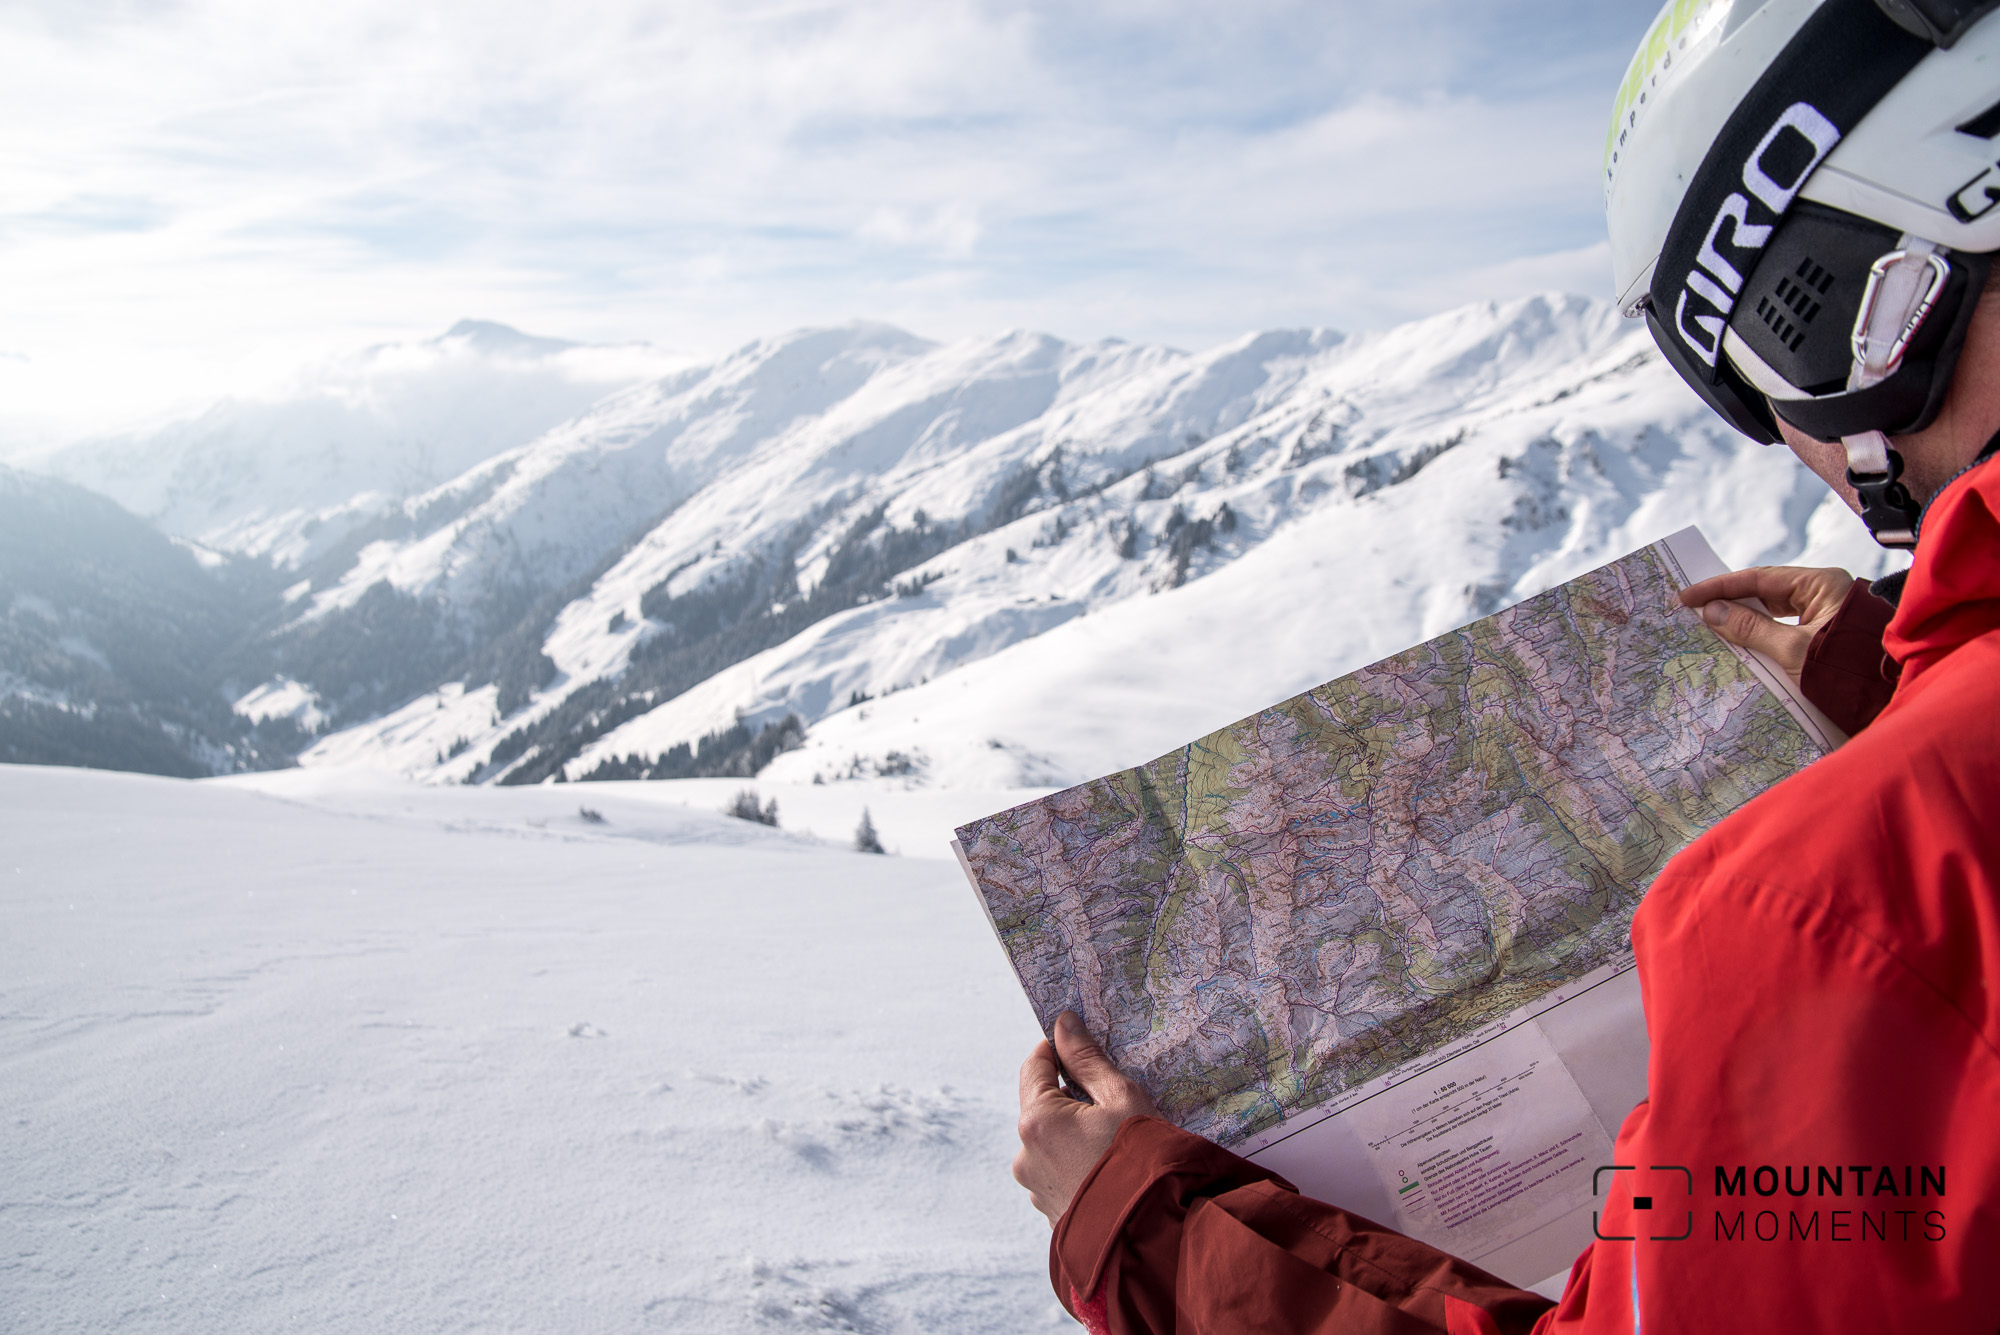 mountain photography, mountain photography tips, bergfotografie tipps, bergfotografie, tour planning, photo tour, photo tour planning